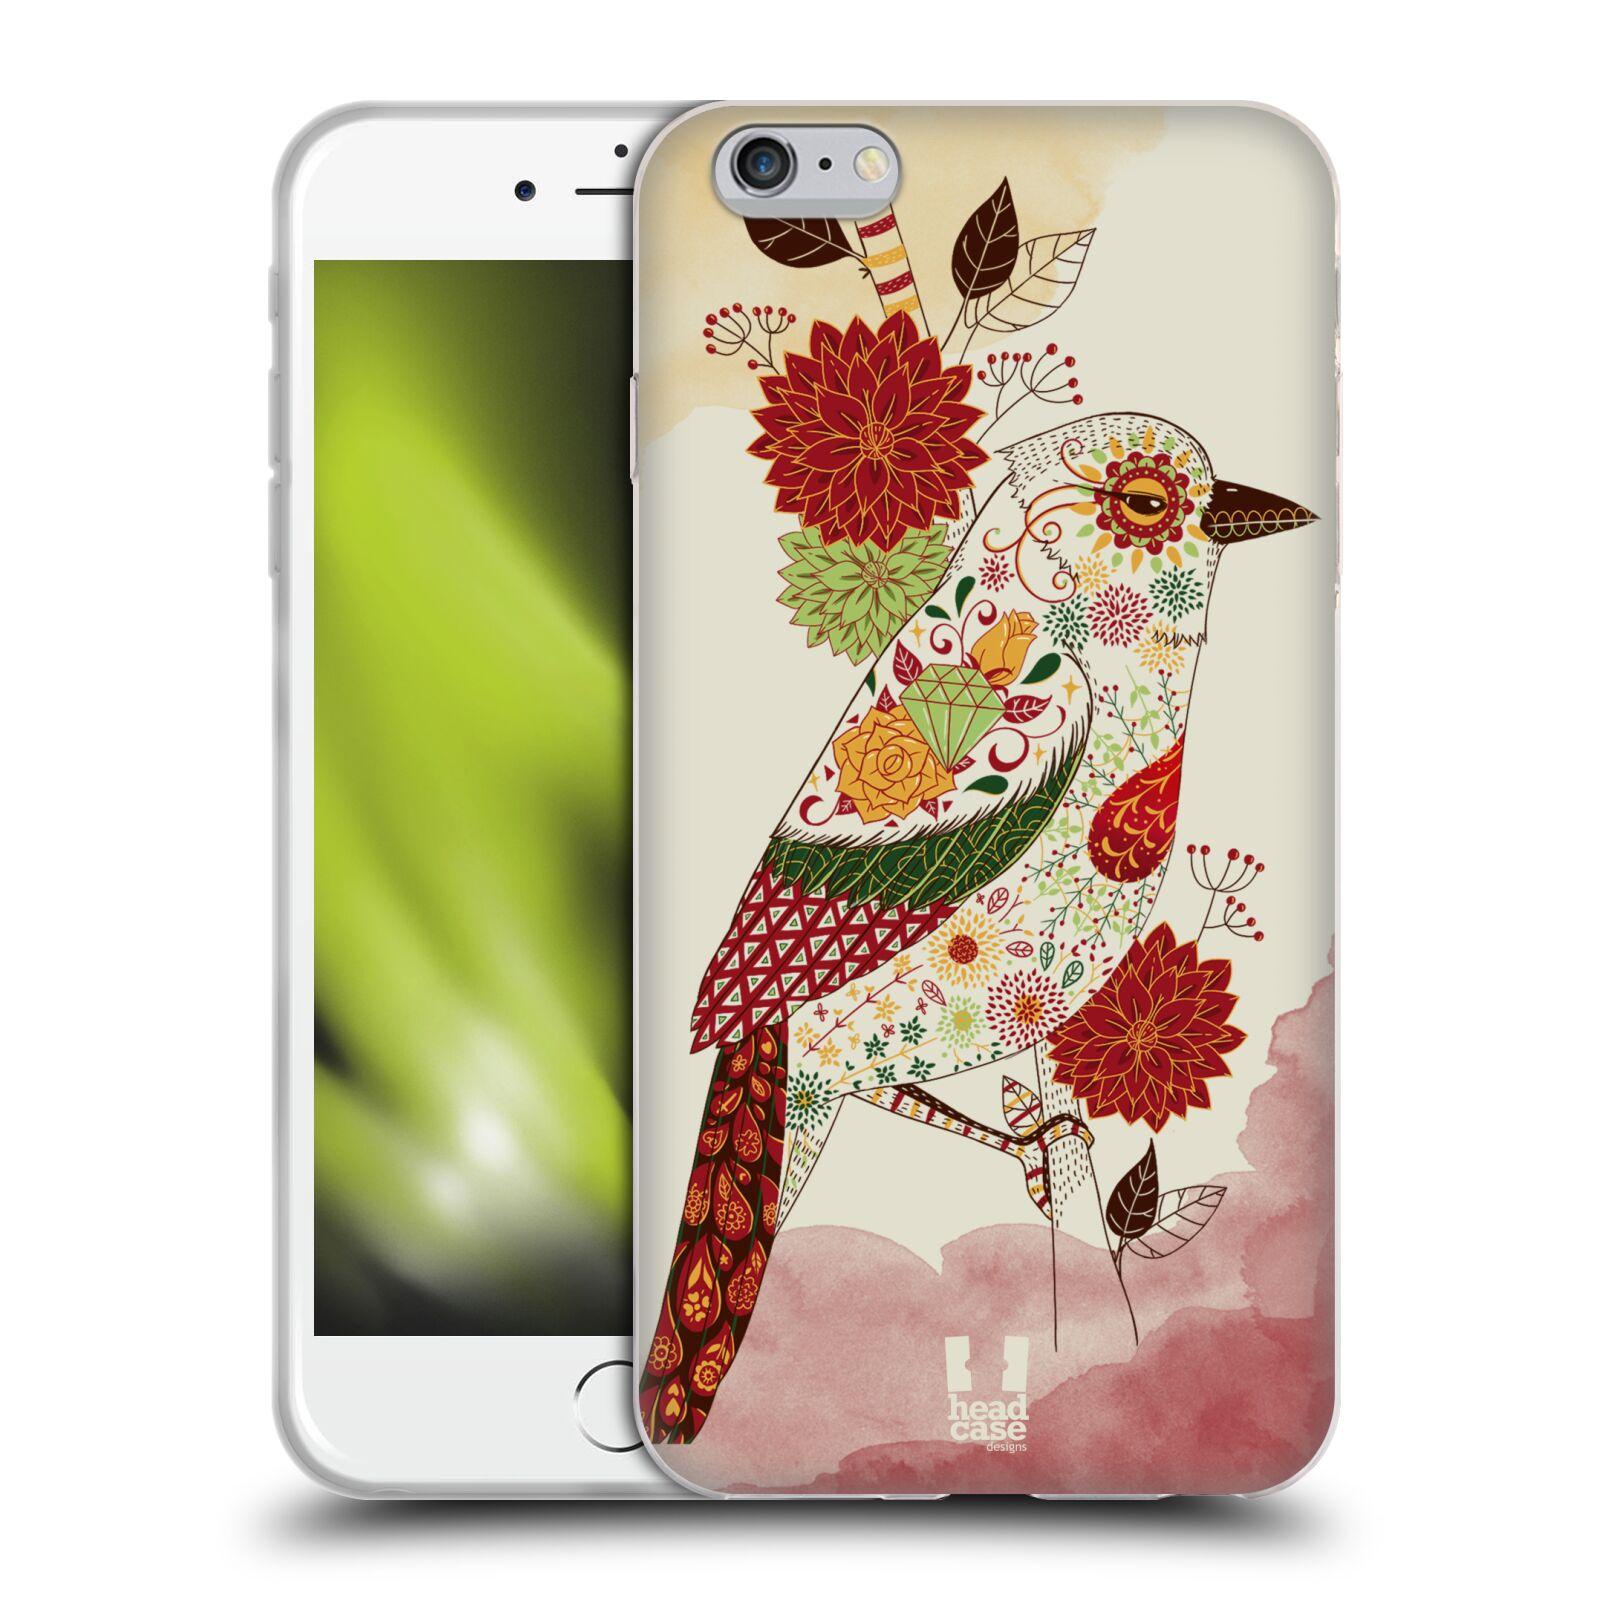 HEAD CASE silikonový obal na mobil Apple Iphone 6 PLUS/ 6S PLUS vzor Květina ptáčci RUDÁ